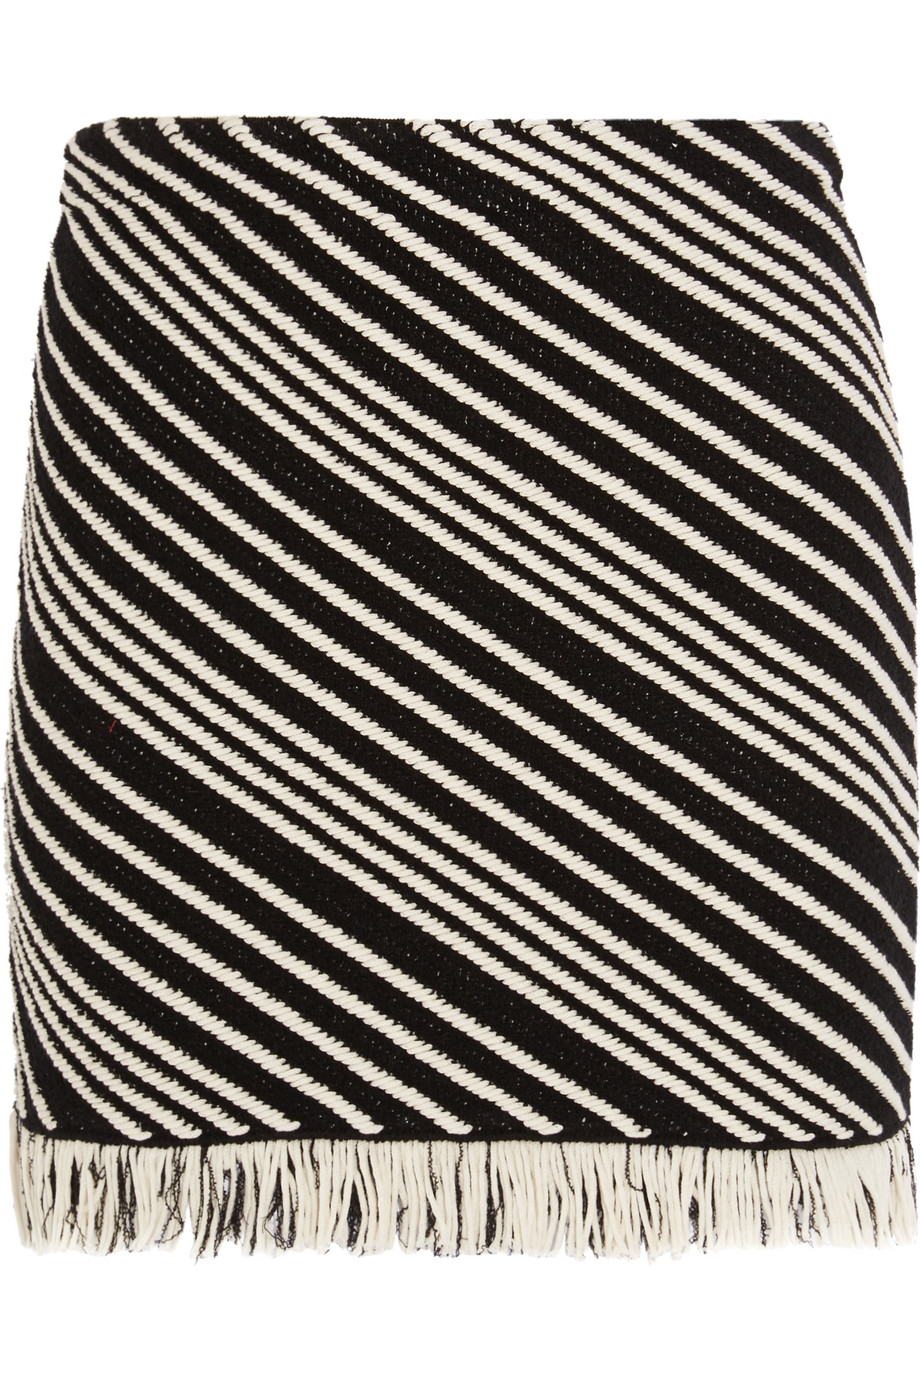 Sonia Rykiel Fringed Striped Cotton-Blend Mini Skirt, Black, Women's